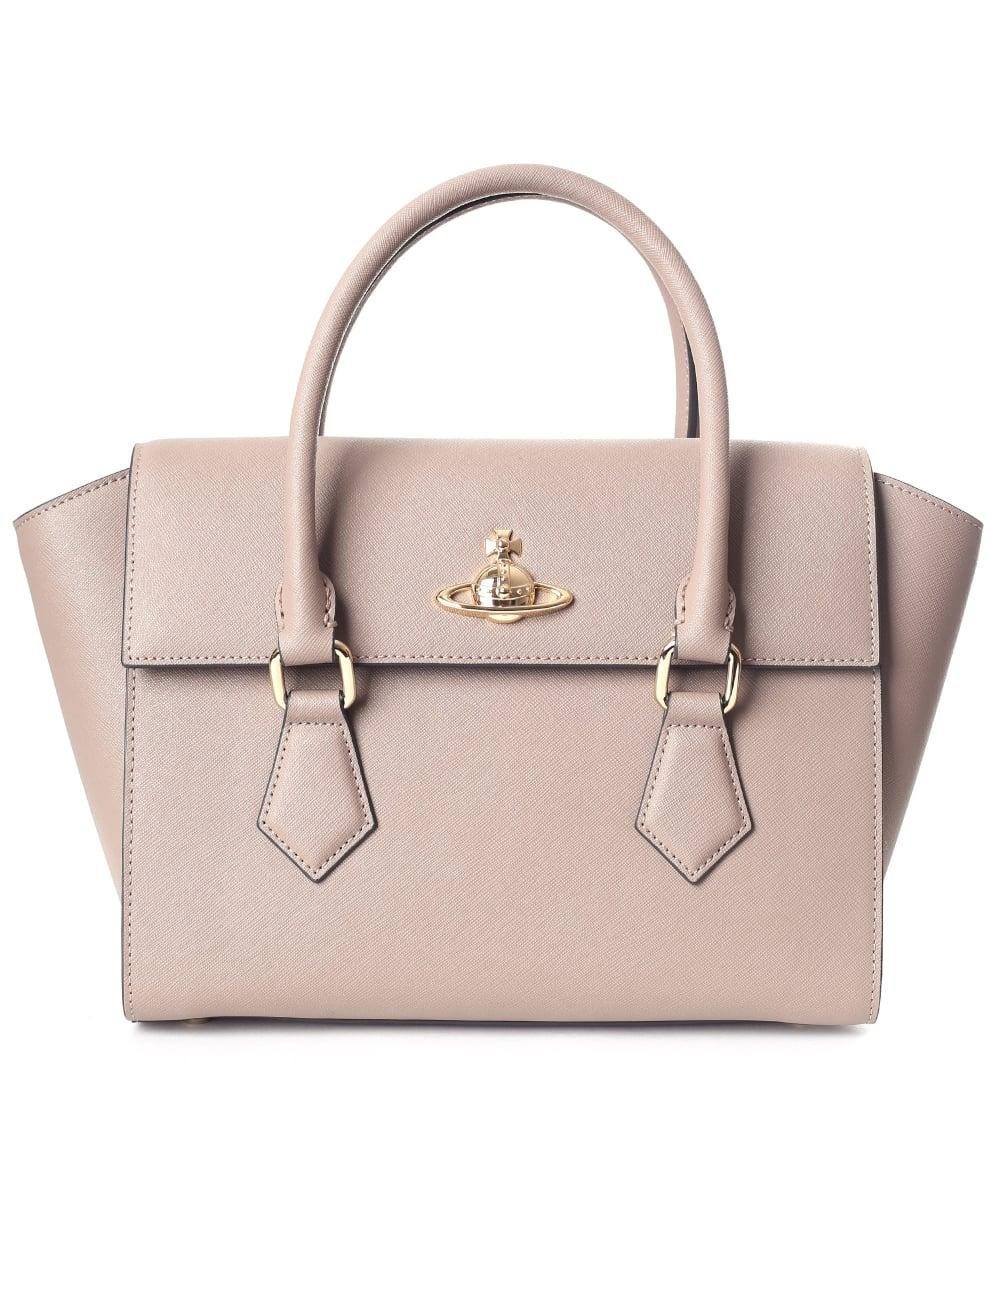 edddf41b38bc Vivienne Westwood Women's Pimlico Medium Handbag